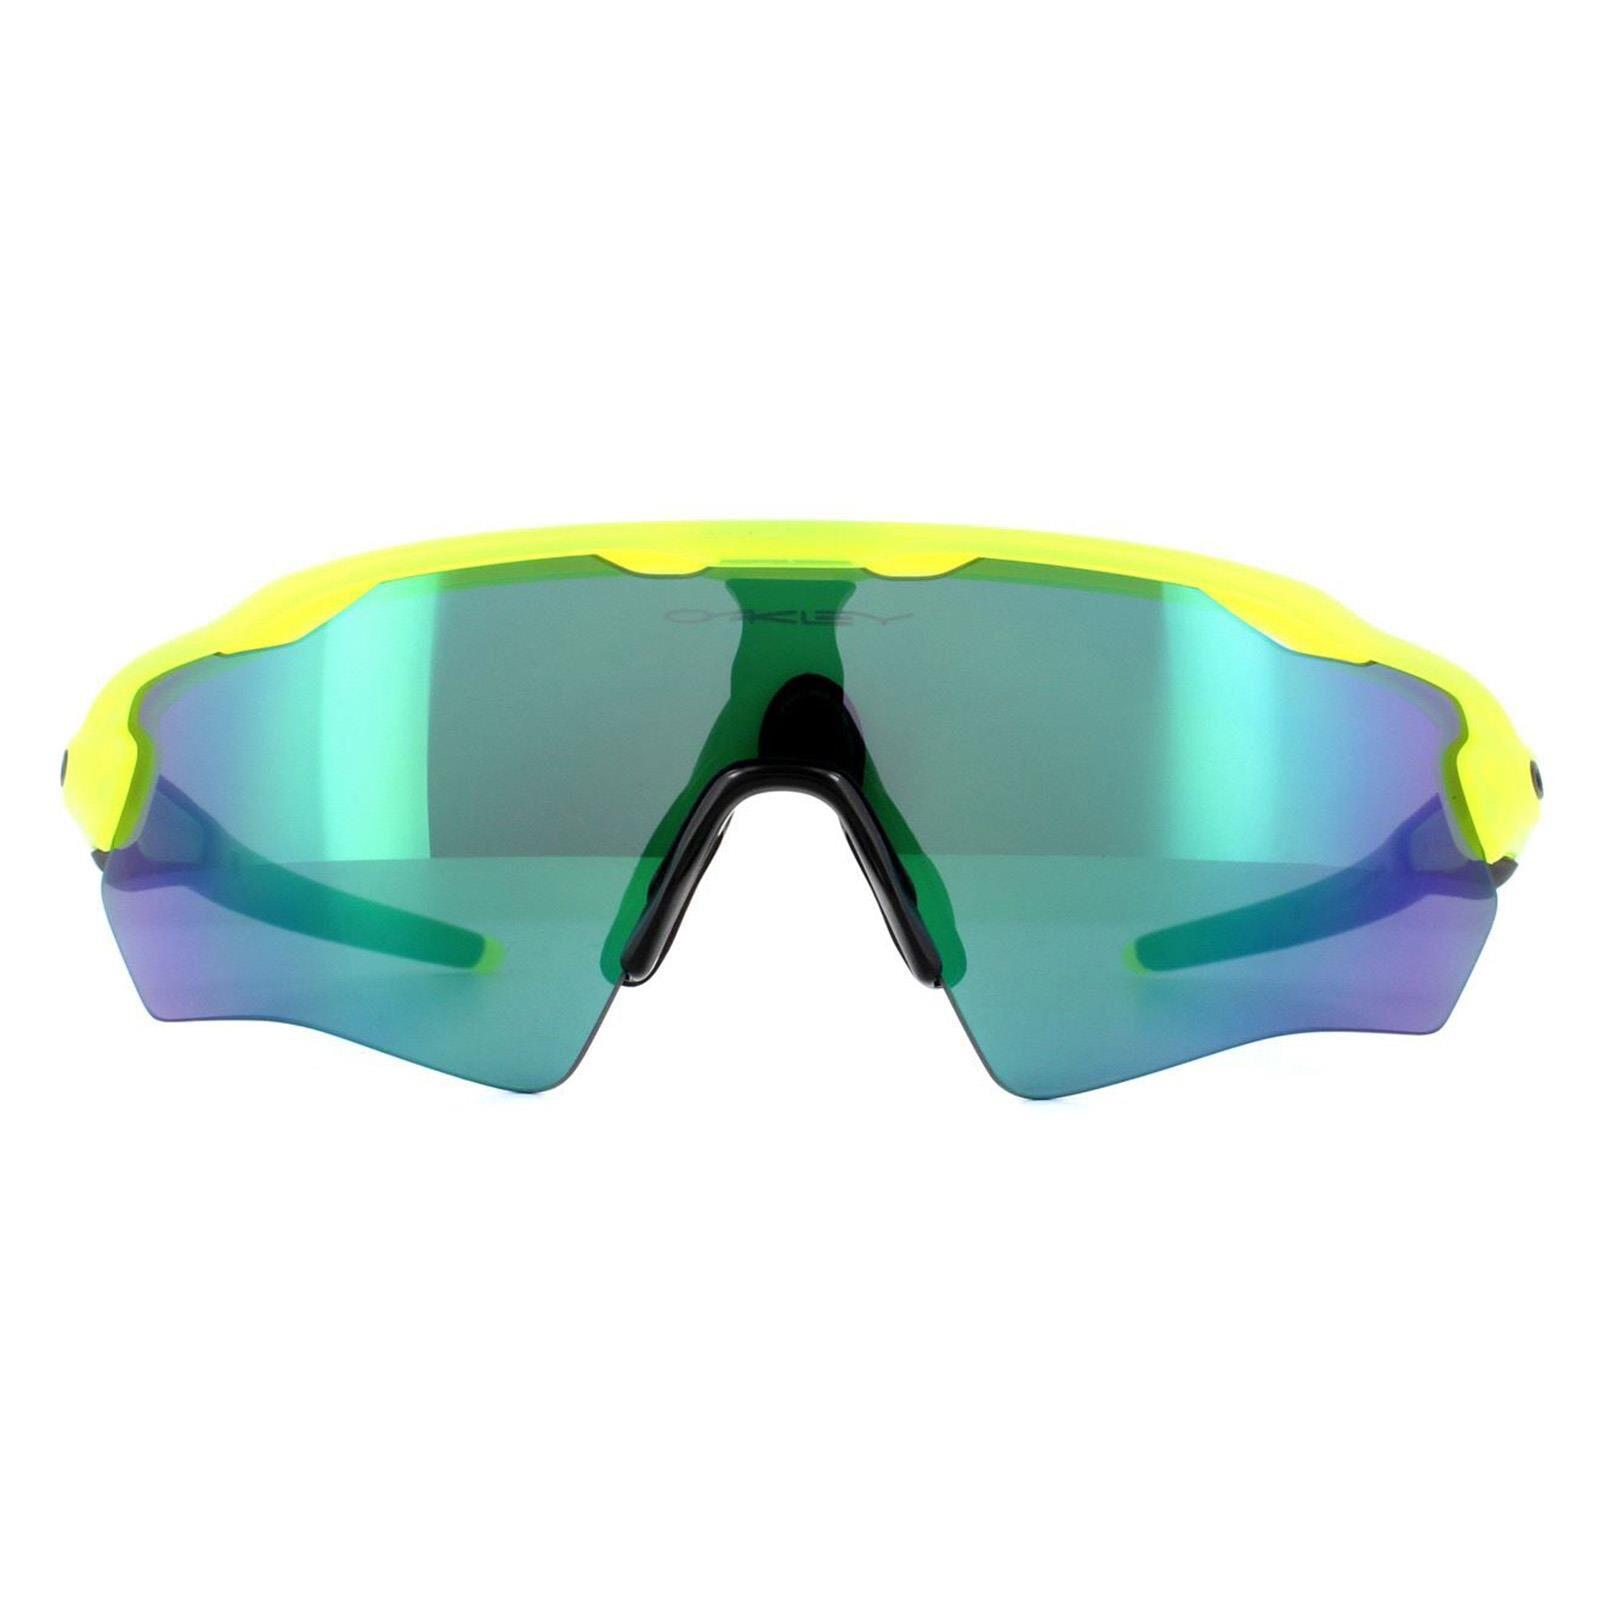 Oakley Sunglasses Radar EV XS Path Youth Fit OJ9001-02 Matte Uranium Jade Iridium